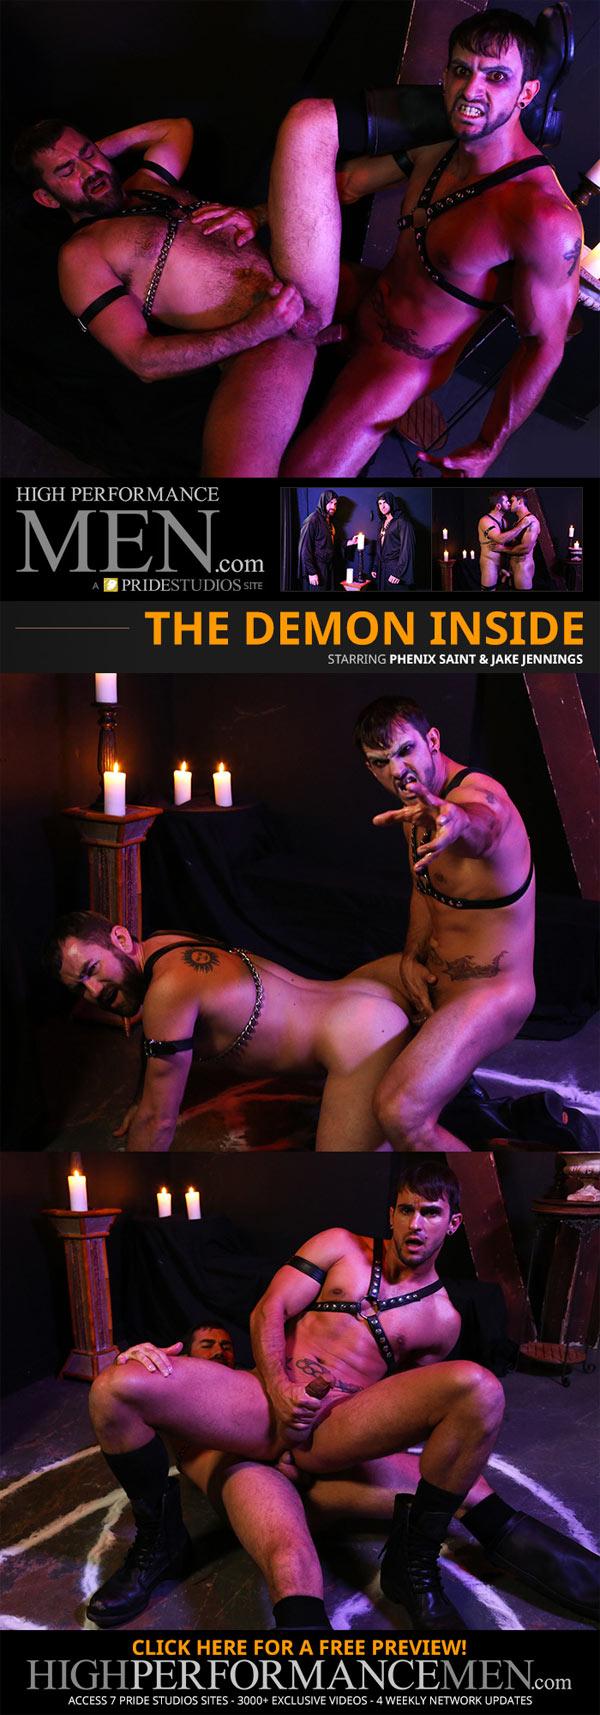 The Demon Inside (Phenix Saint & Jake Jennings) (Flip-Flop) at High Performance Men